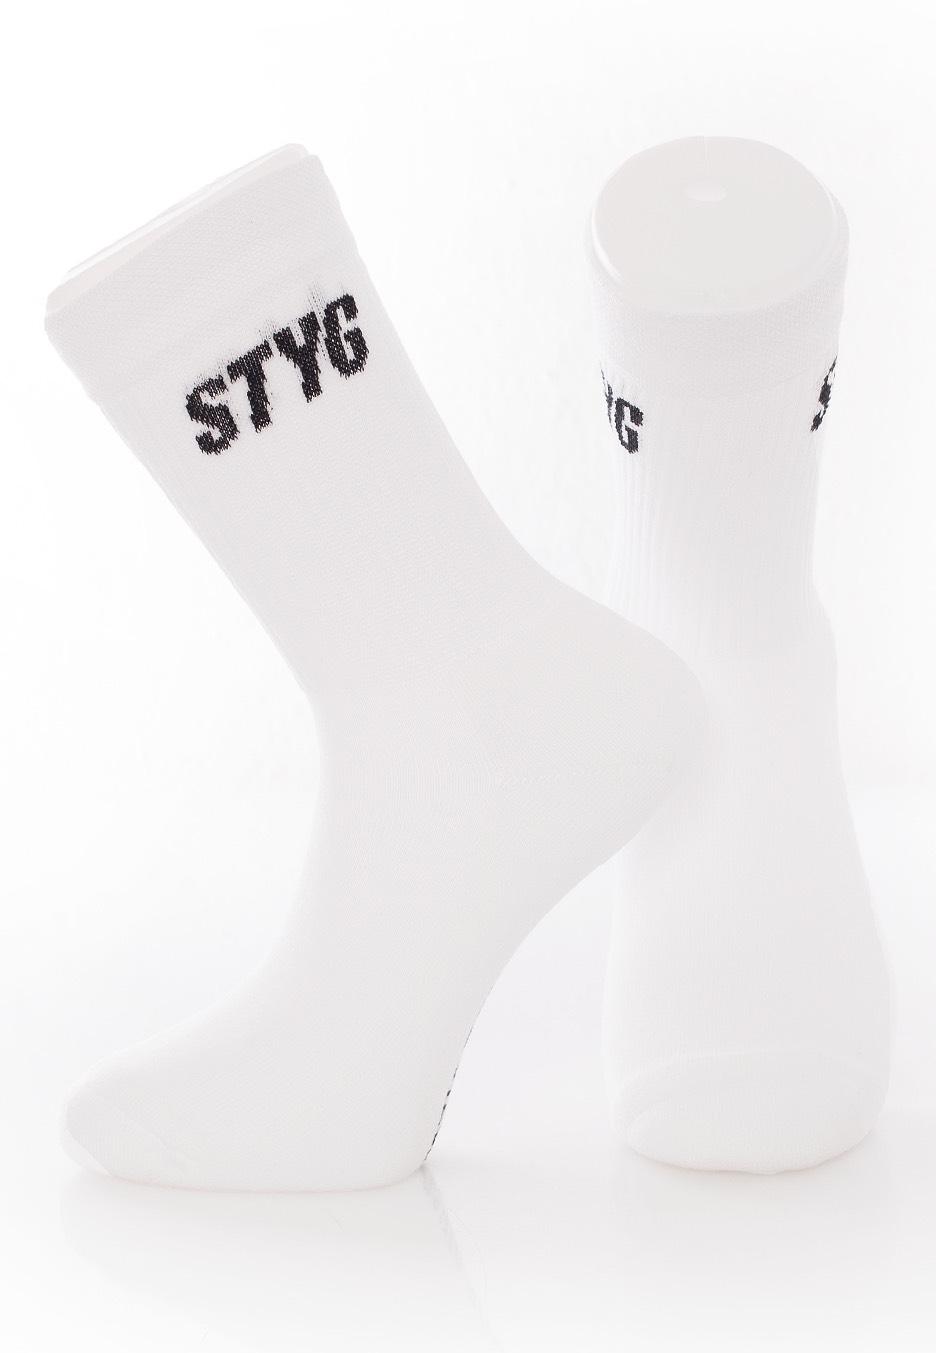 Stick To Your Guns - True View White - Socken